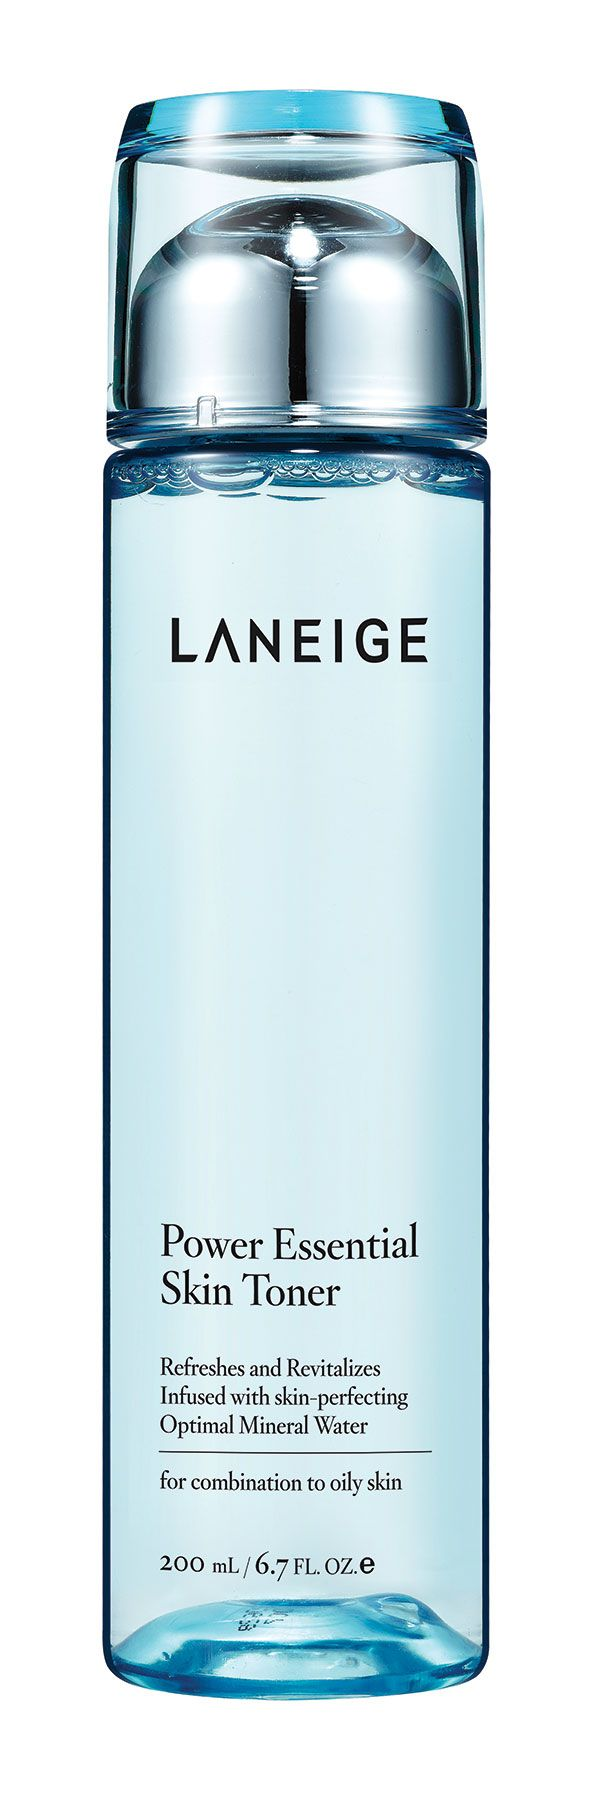 Laneige Power Essential Skin Toner